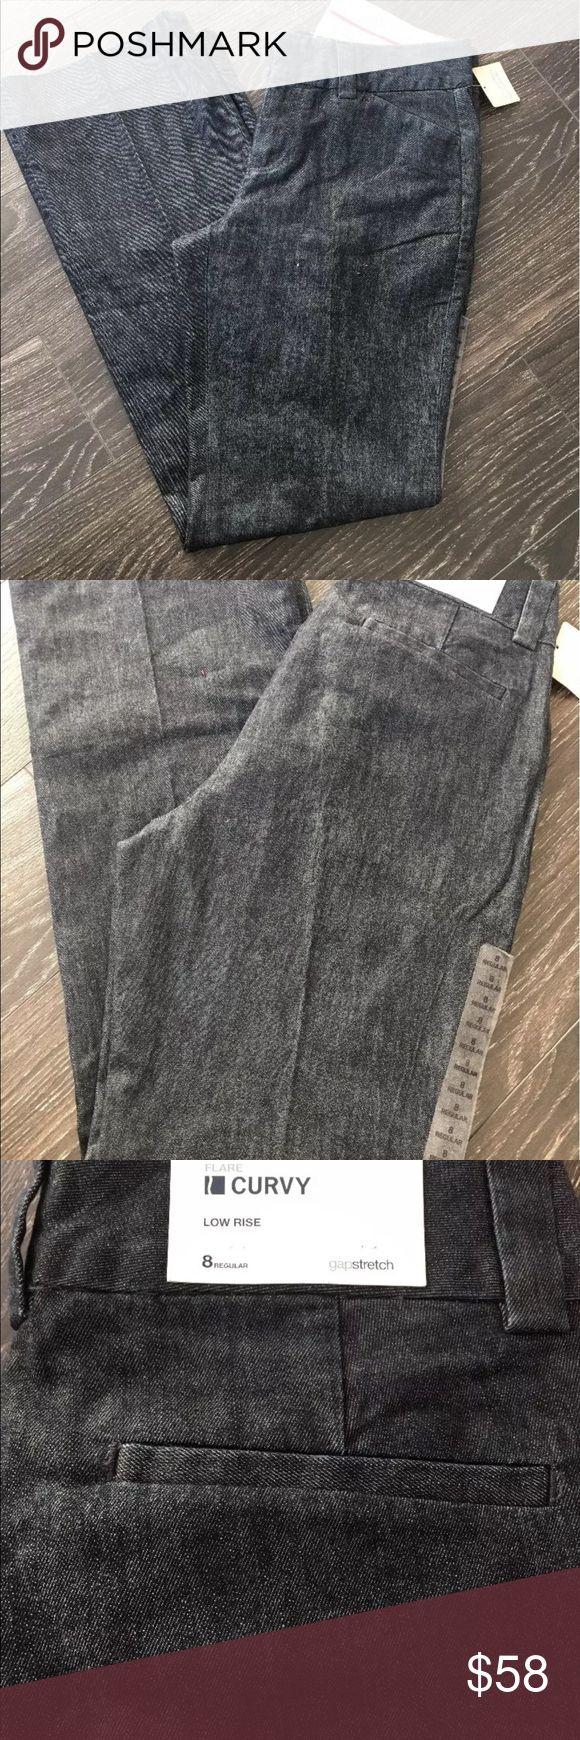 Gap Curvy Jeans NWT GAP Jeans